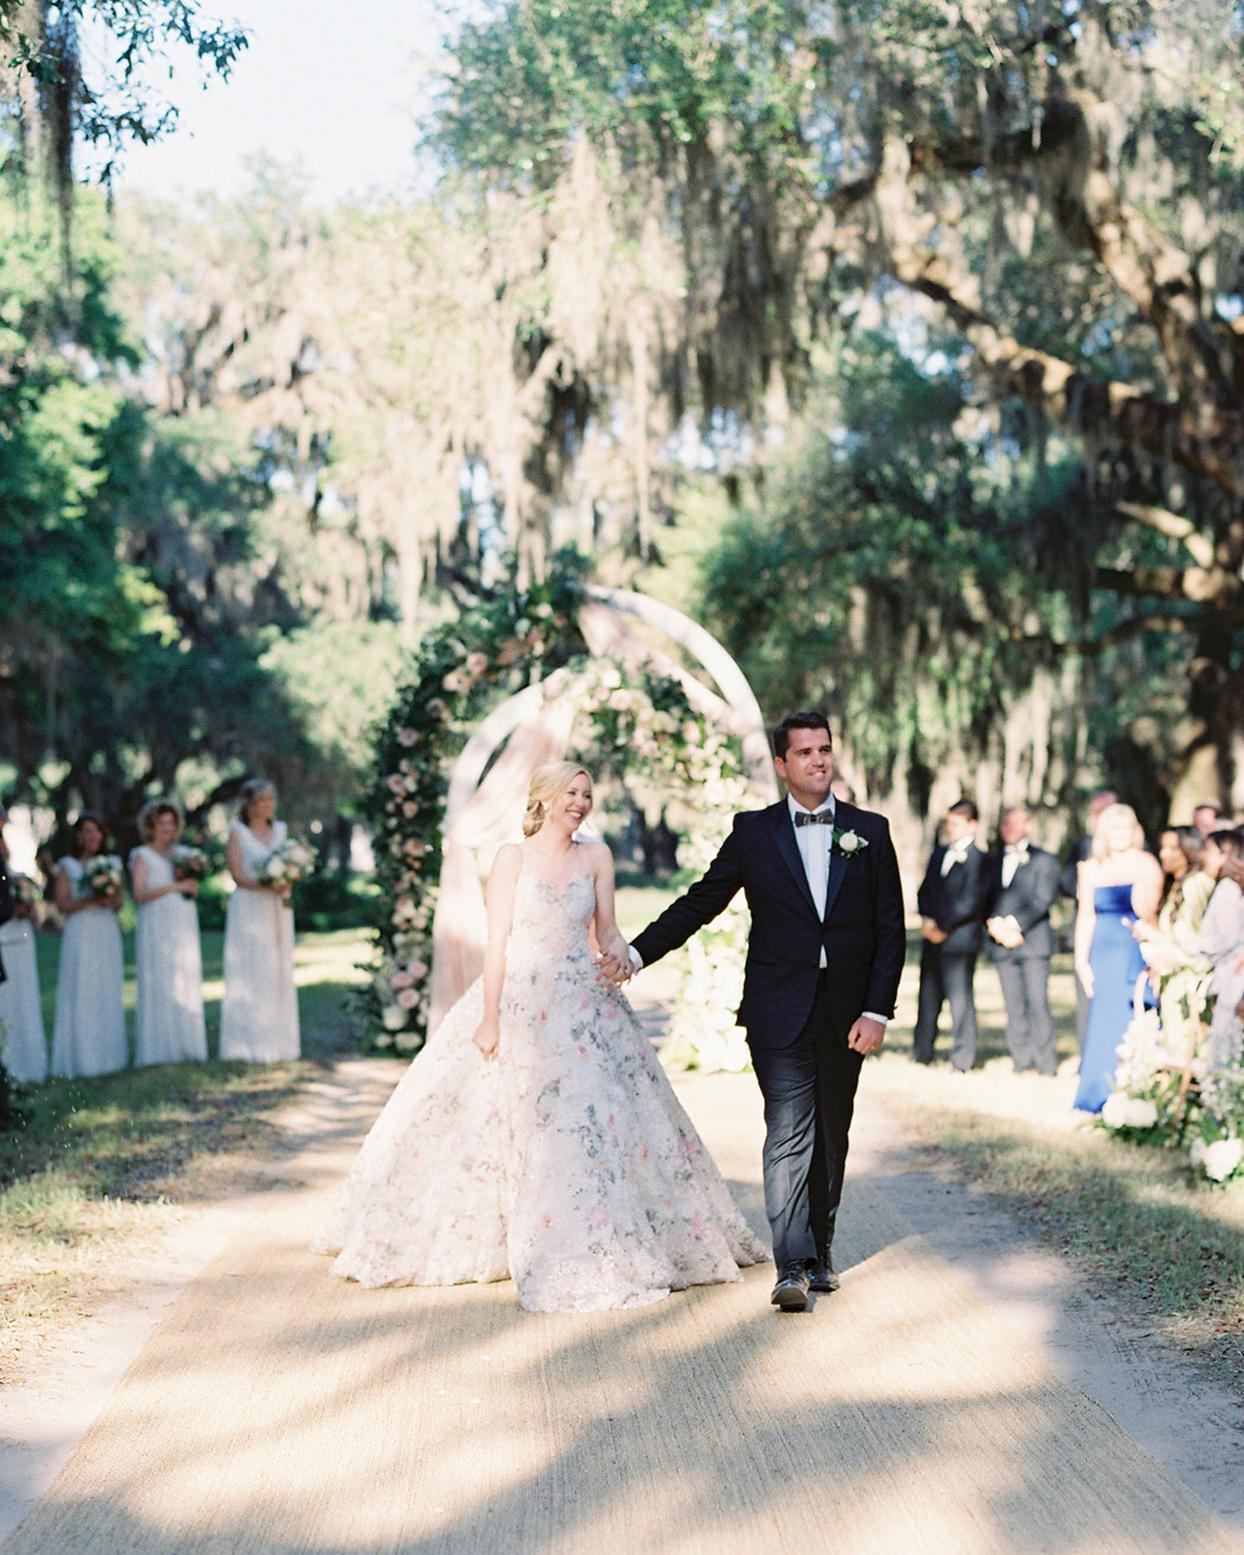 chelsea john wedding ceremony recessional bride and groom